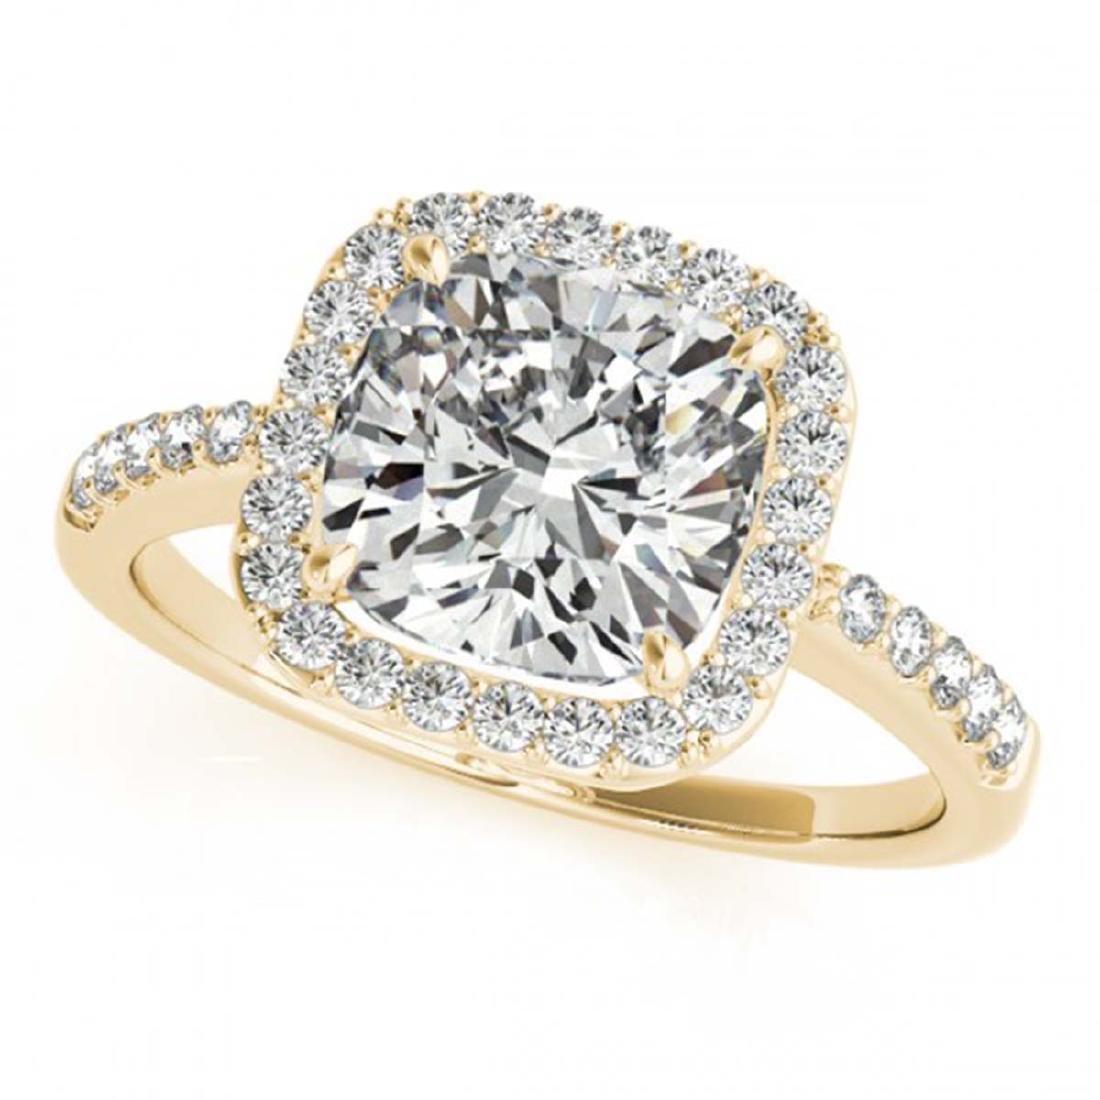 0.60 ctw VS/SI Cushion Diamond Halo Ring 18K Yellow